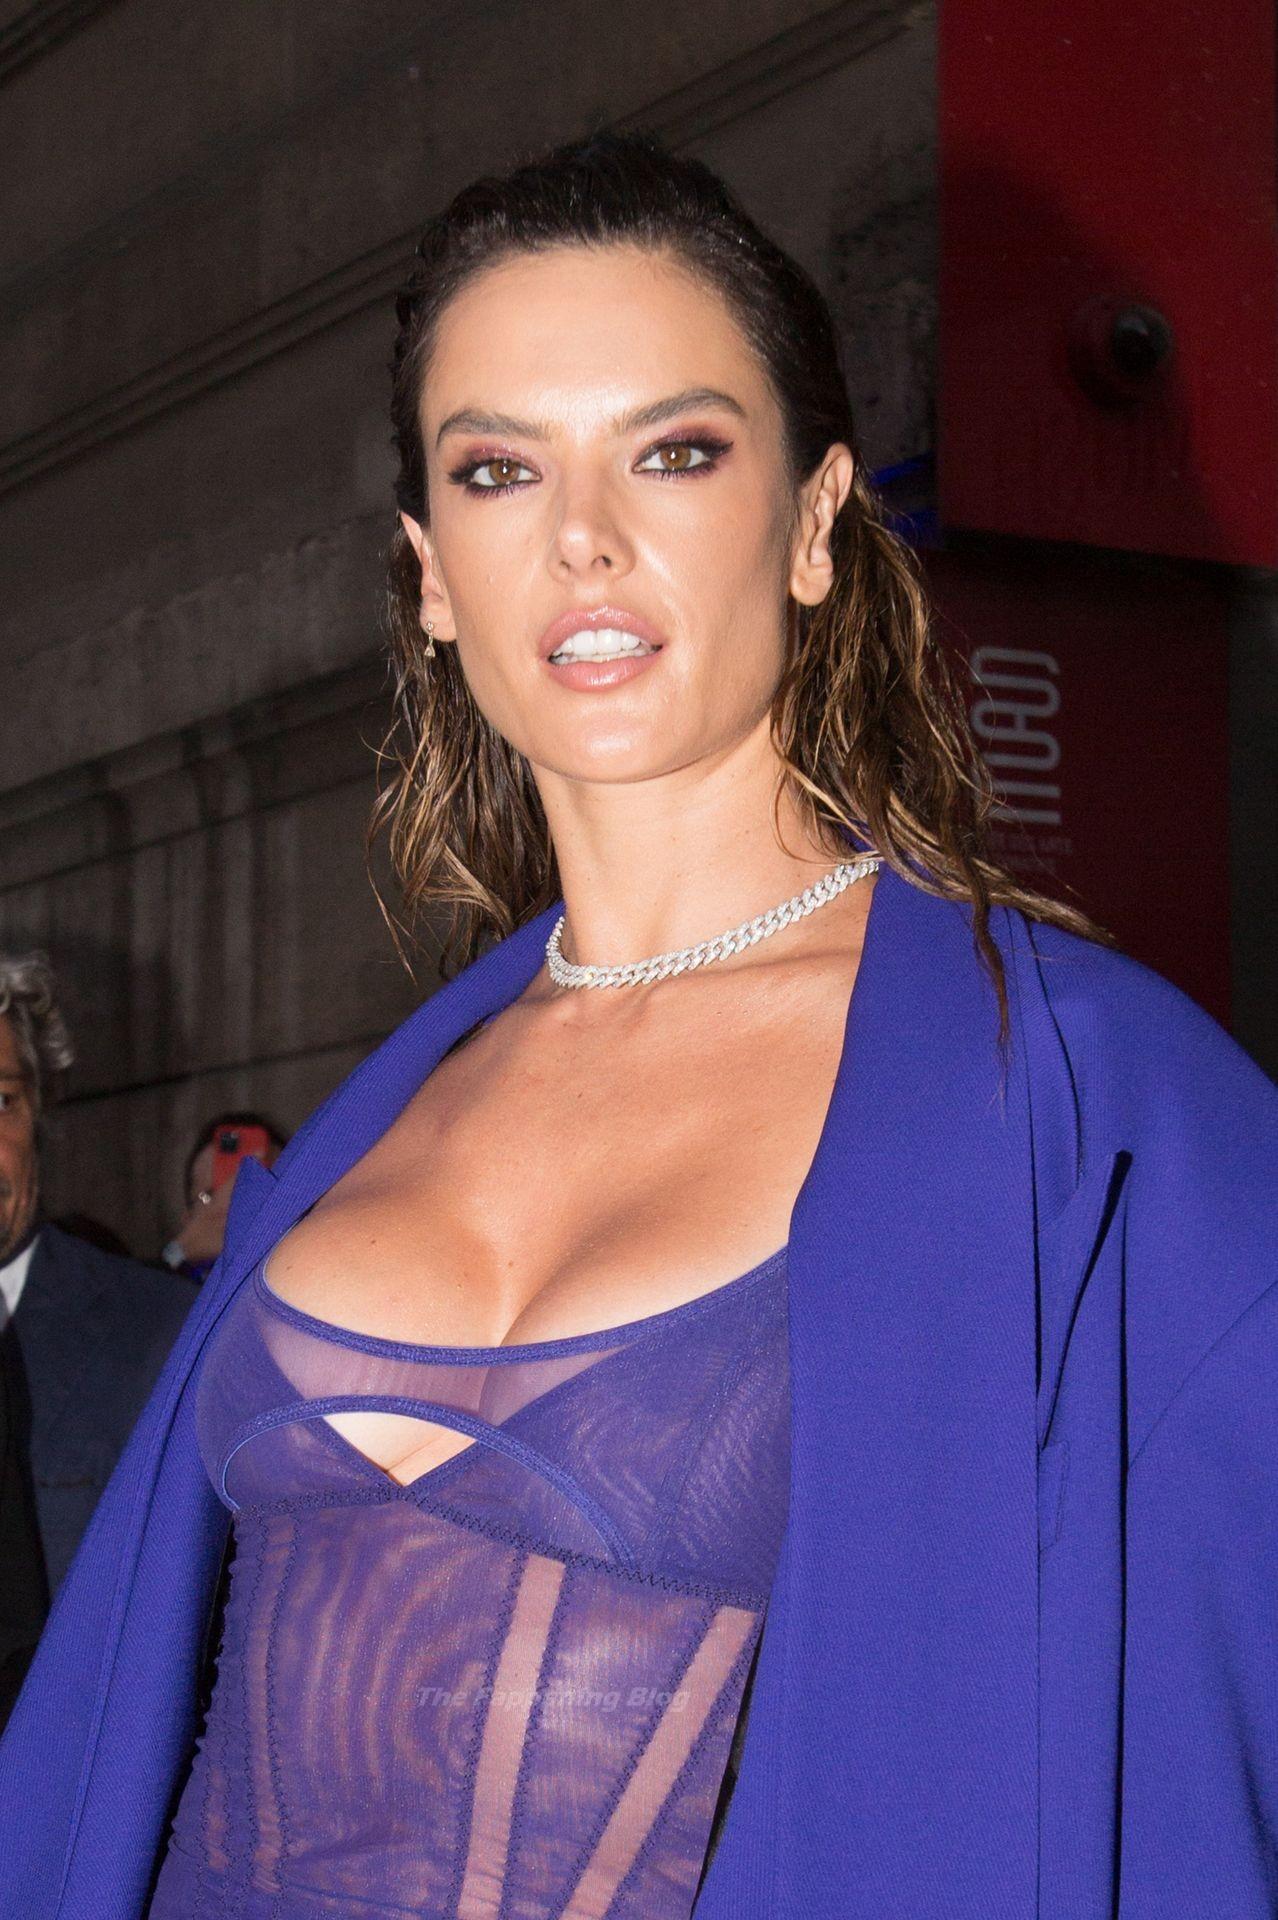 Alessandra-Ambrosio-Sexy-The-Fappening-Blog-12-3.jpg